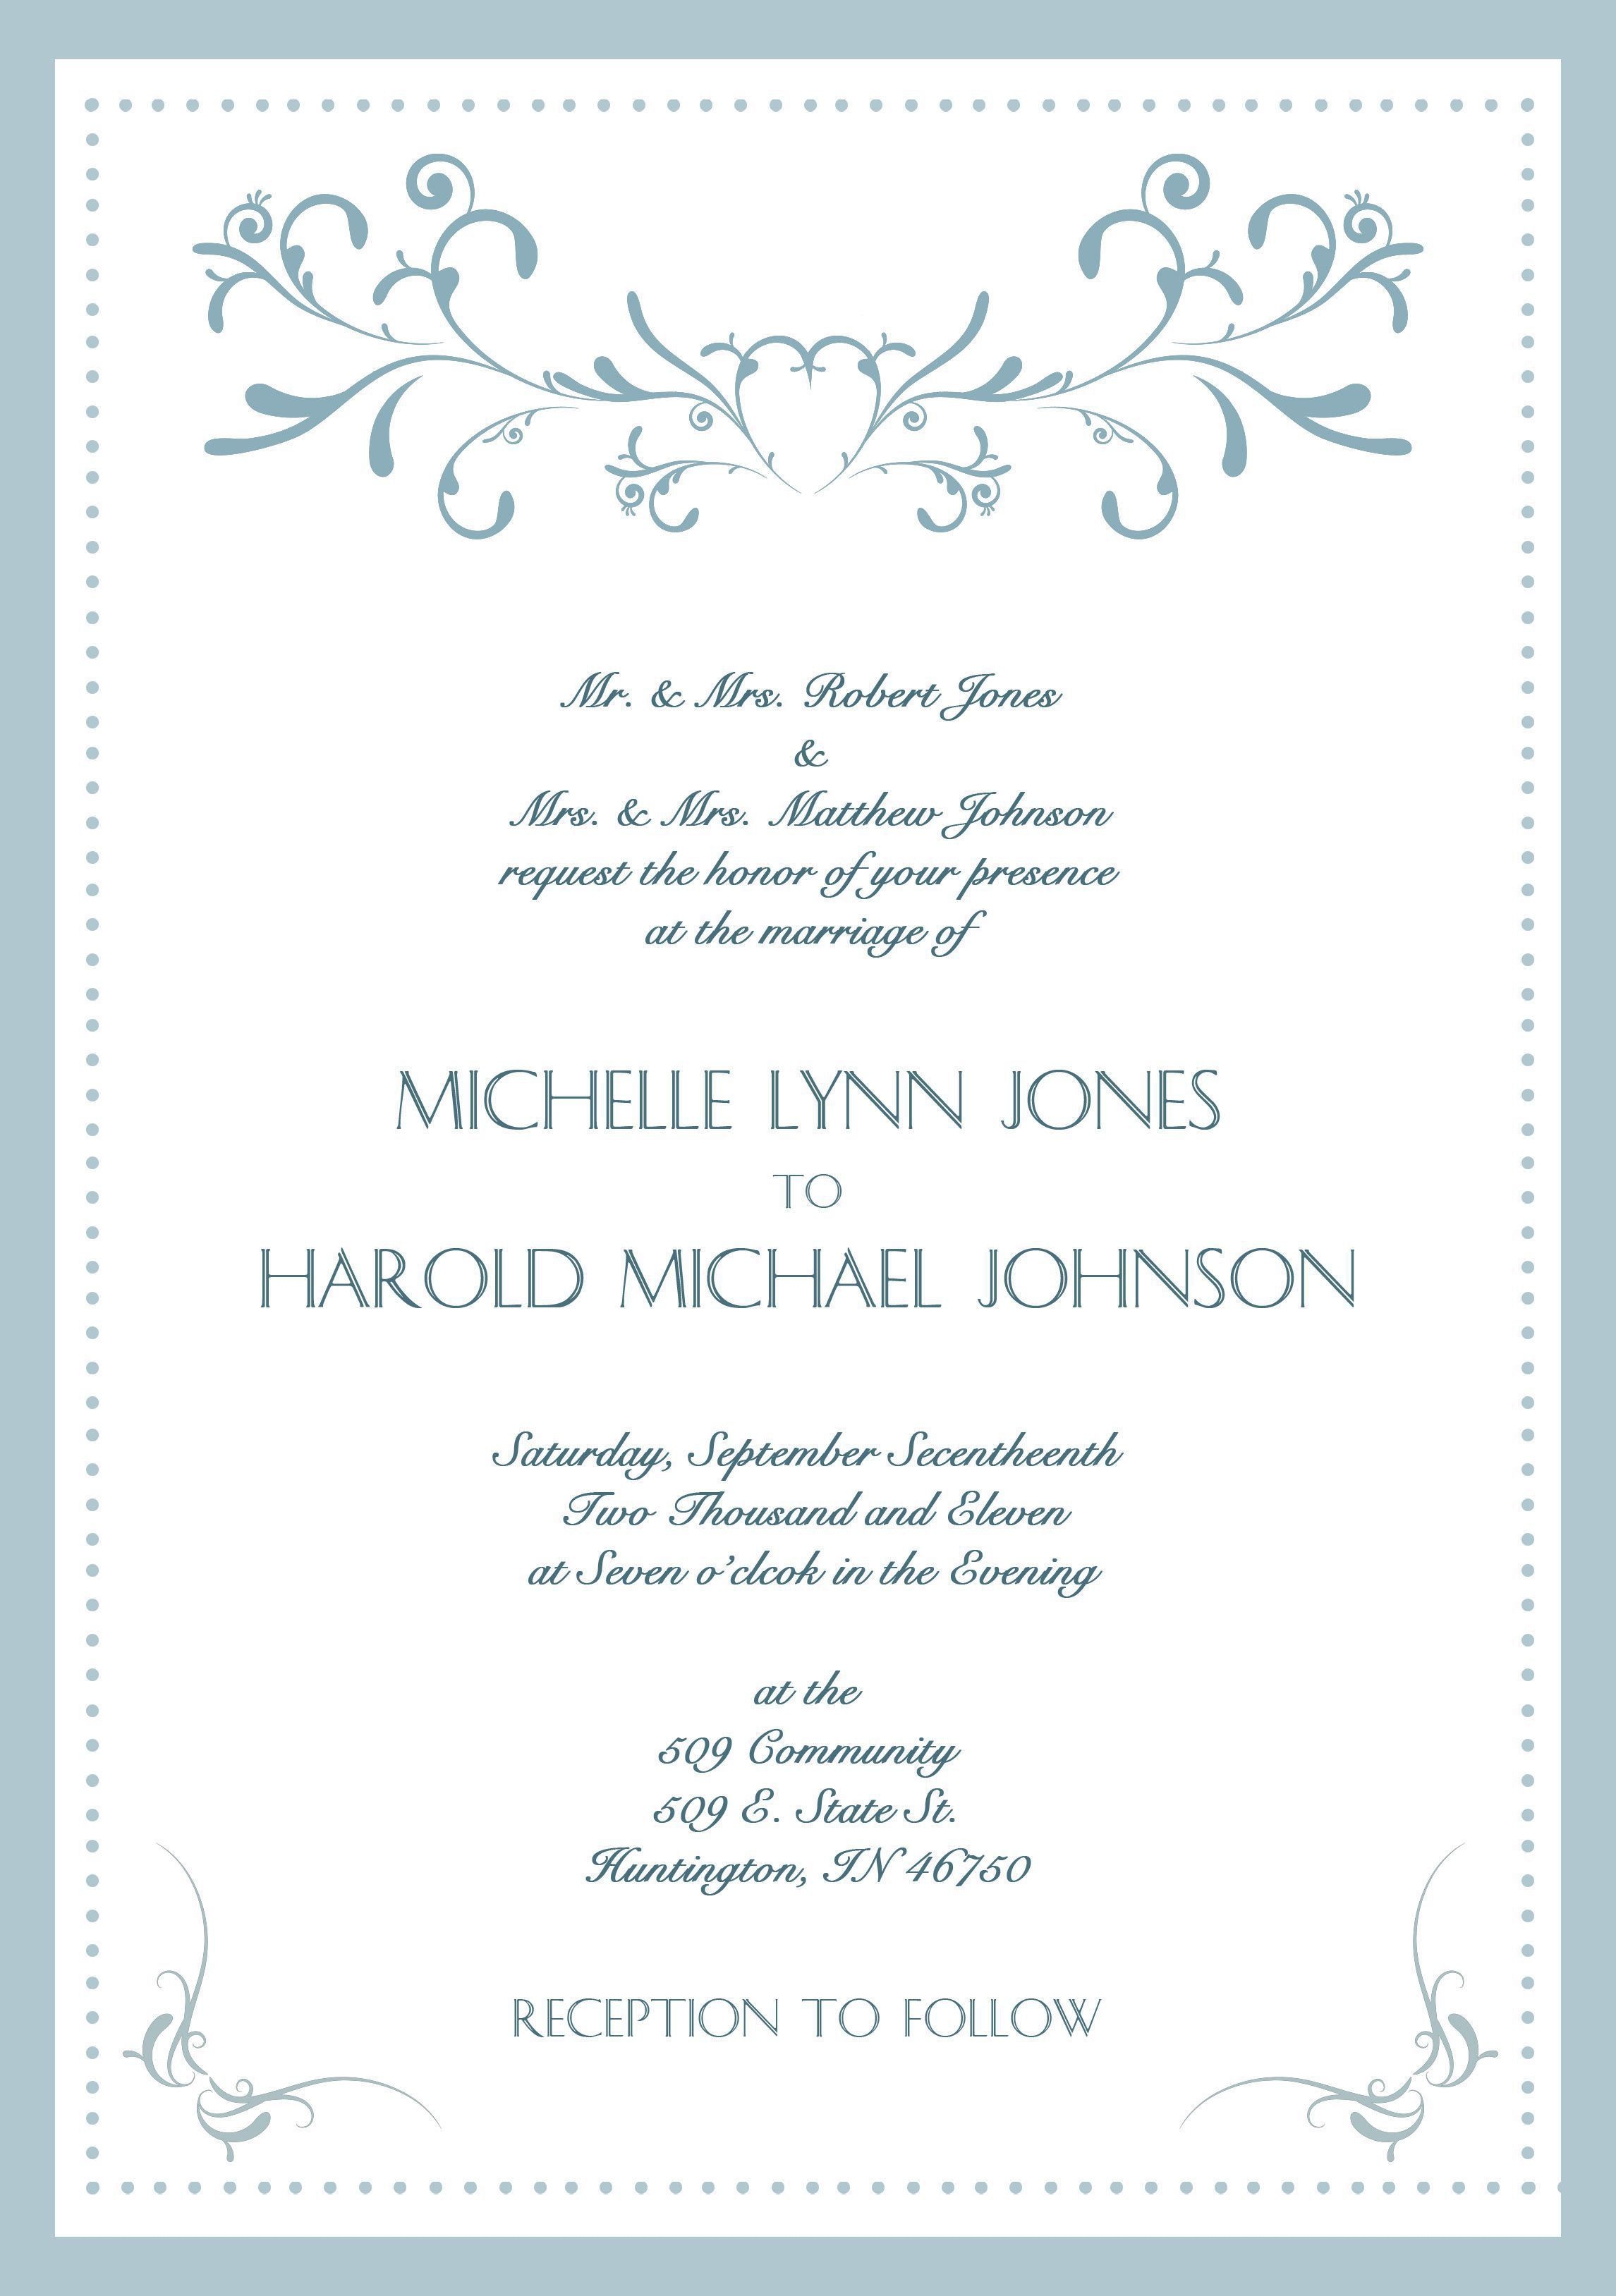 sample wedding invitation cards in